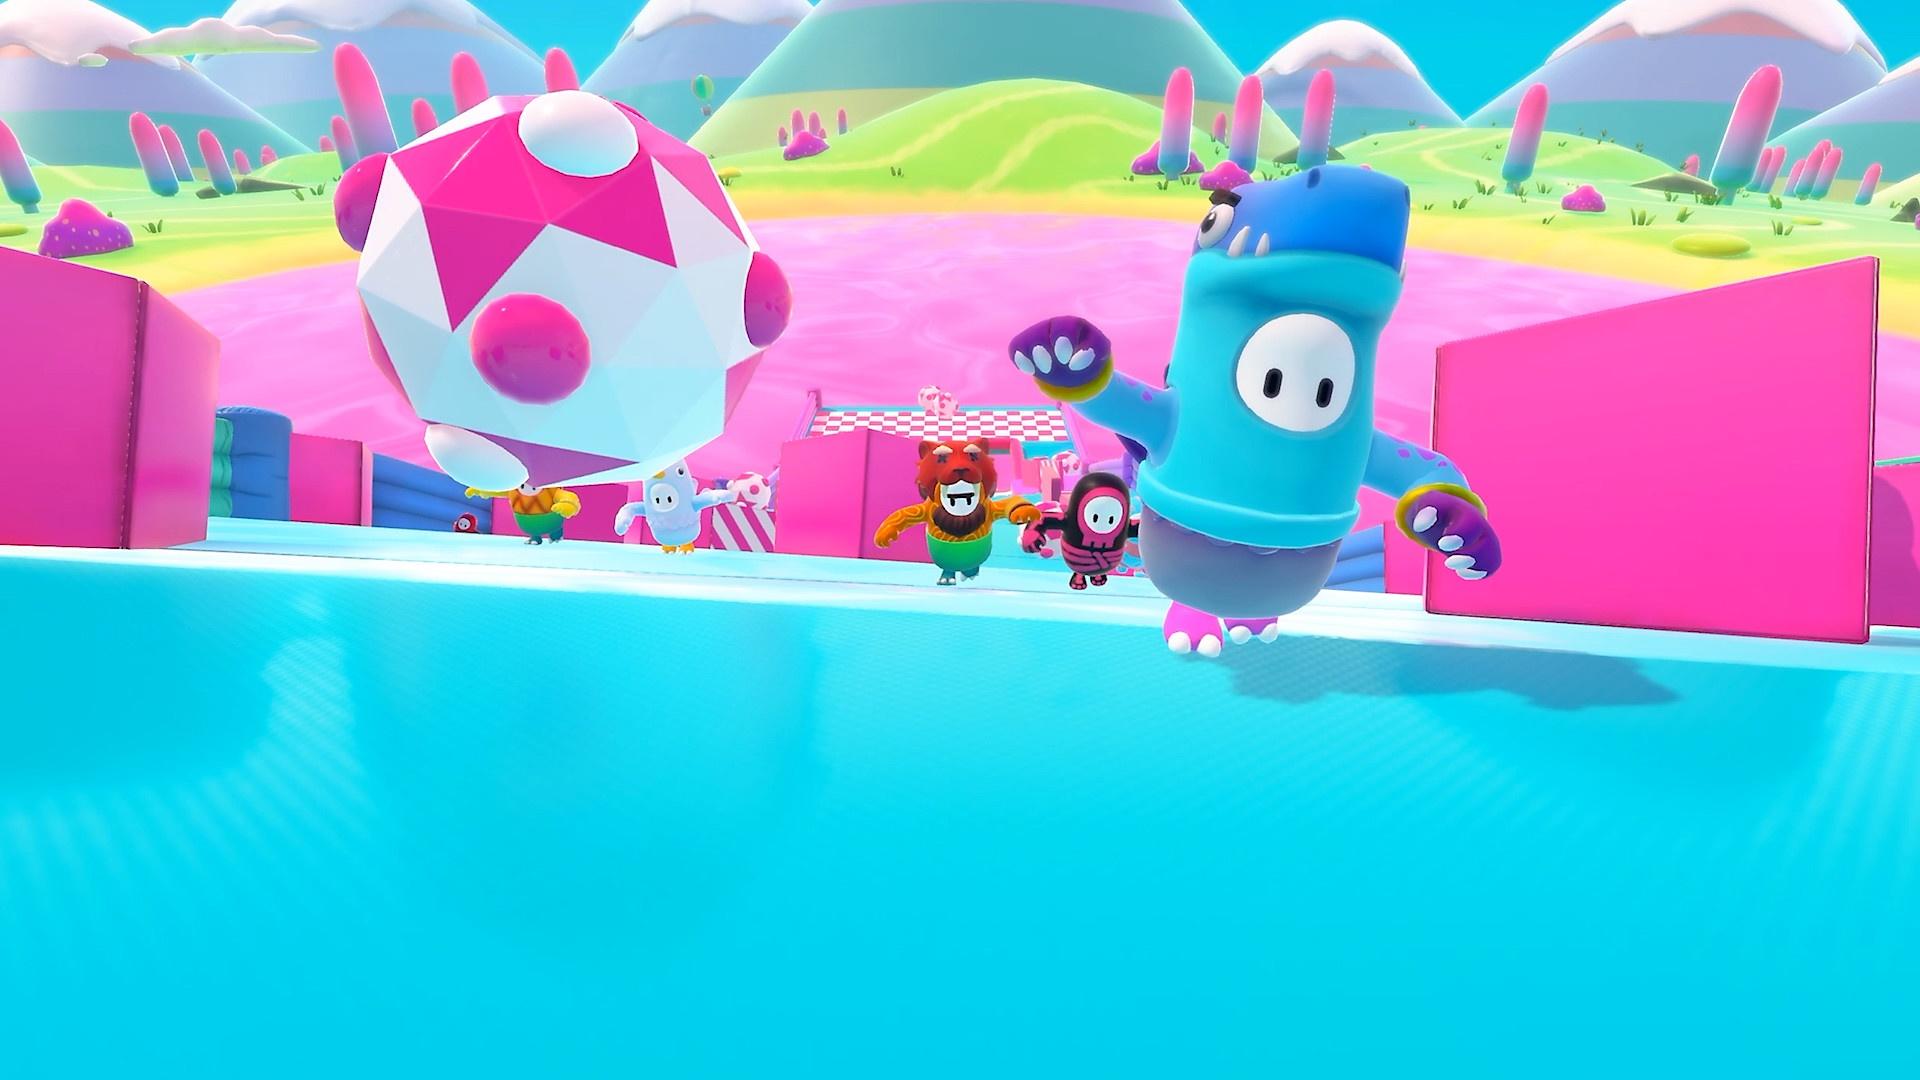 Fall Guys screenshot from minigame